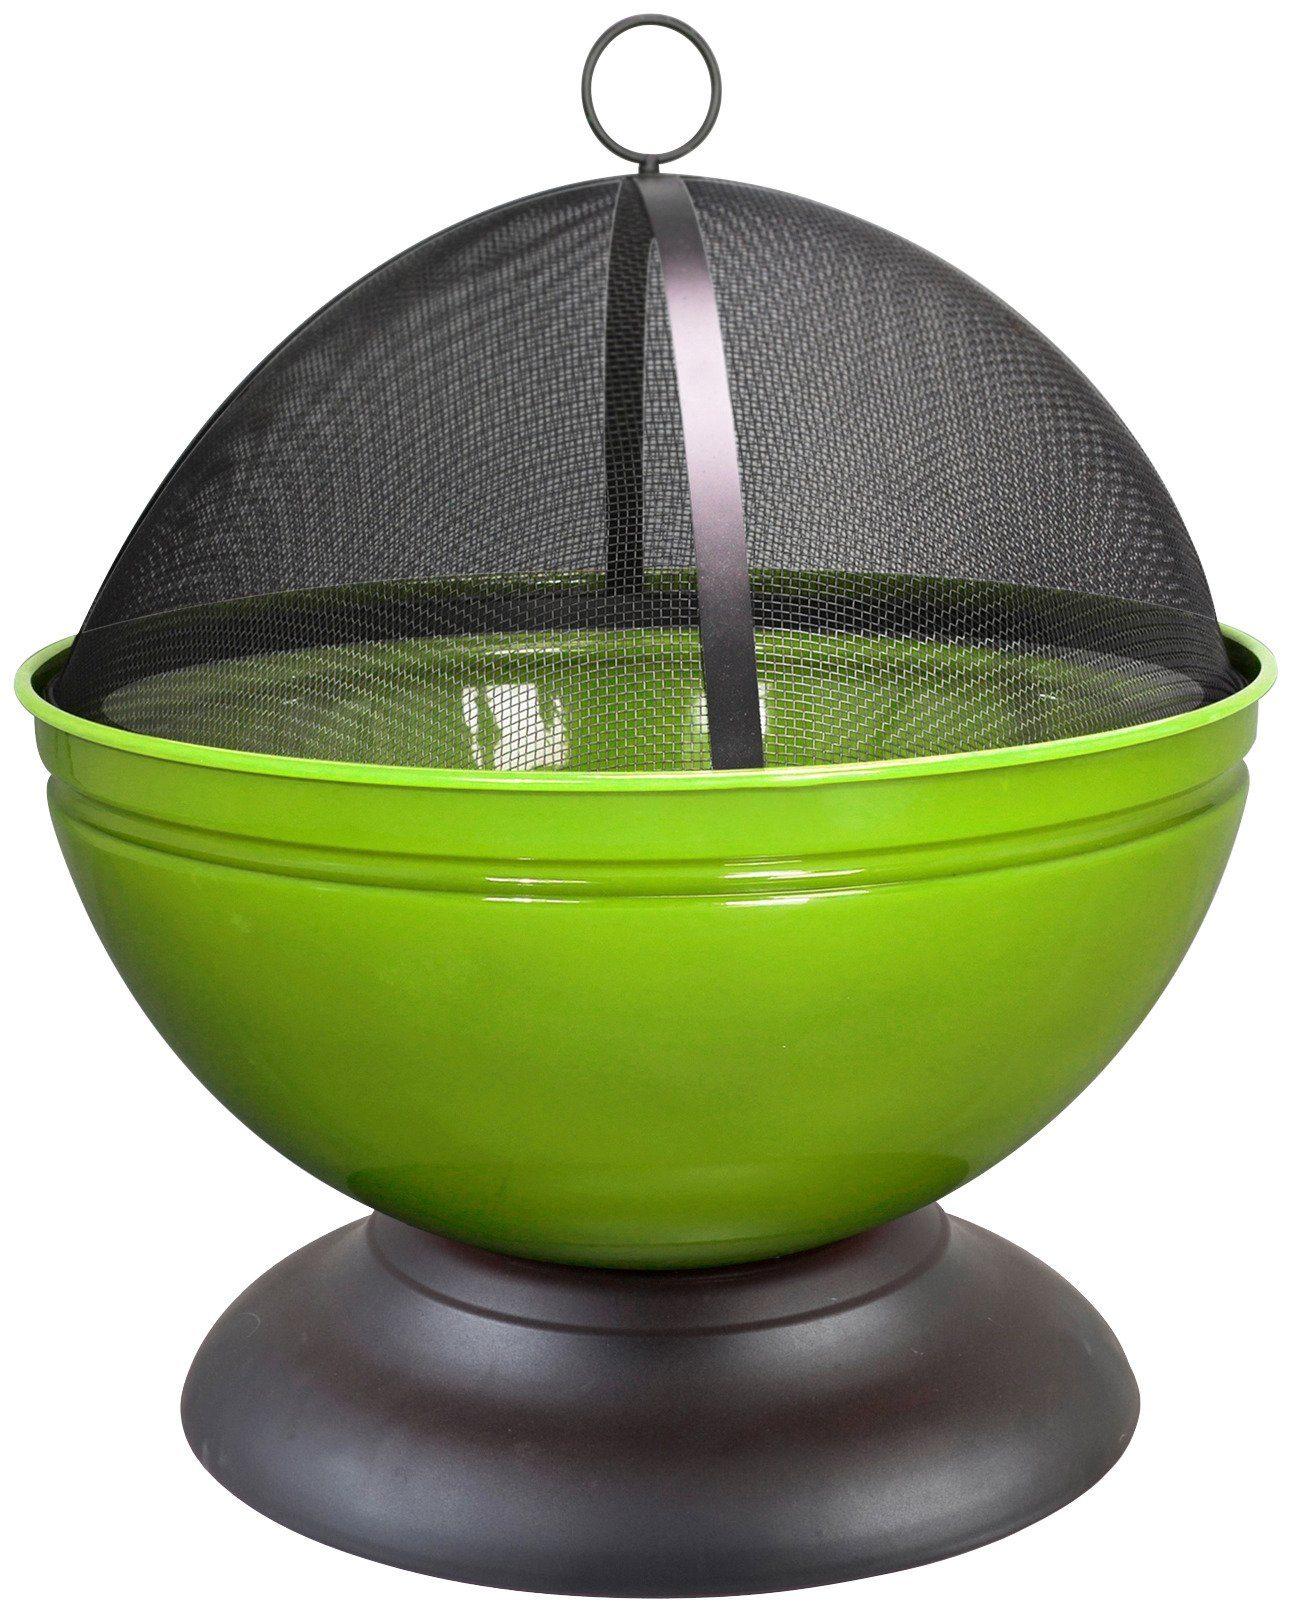 Feuerschale »Globe« inkl. Funkenschutzhaube, hellgrün